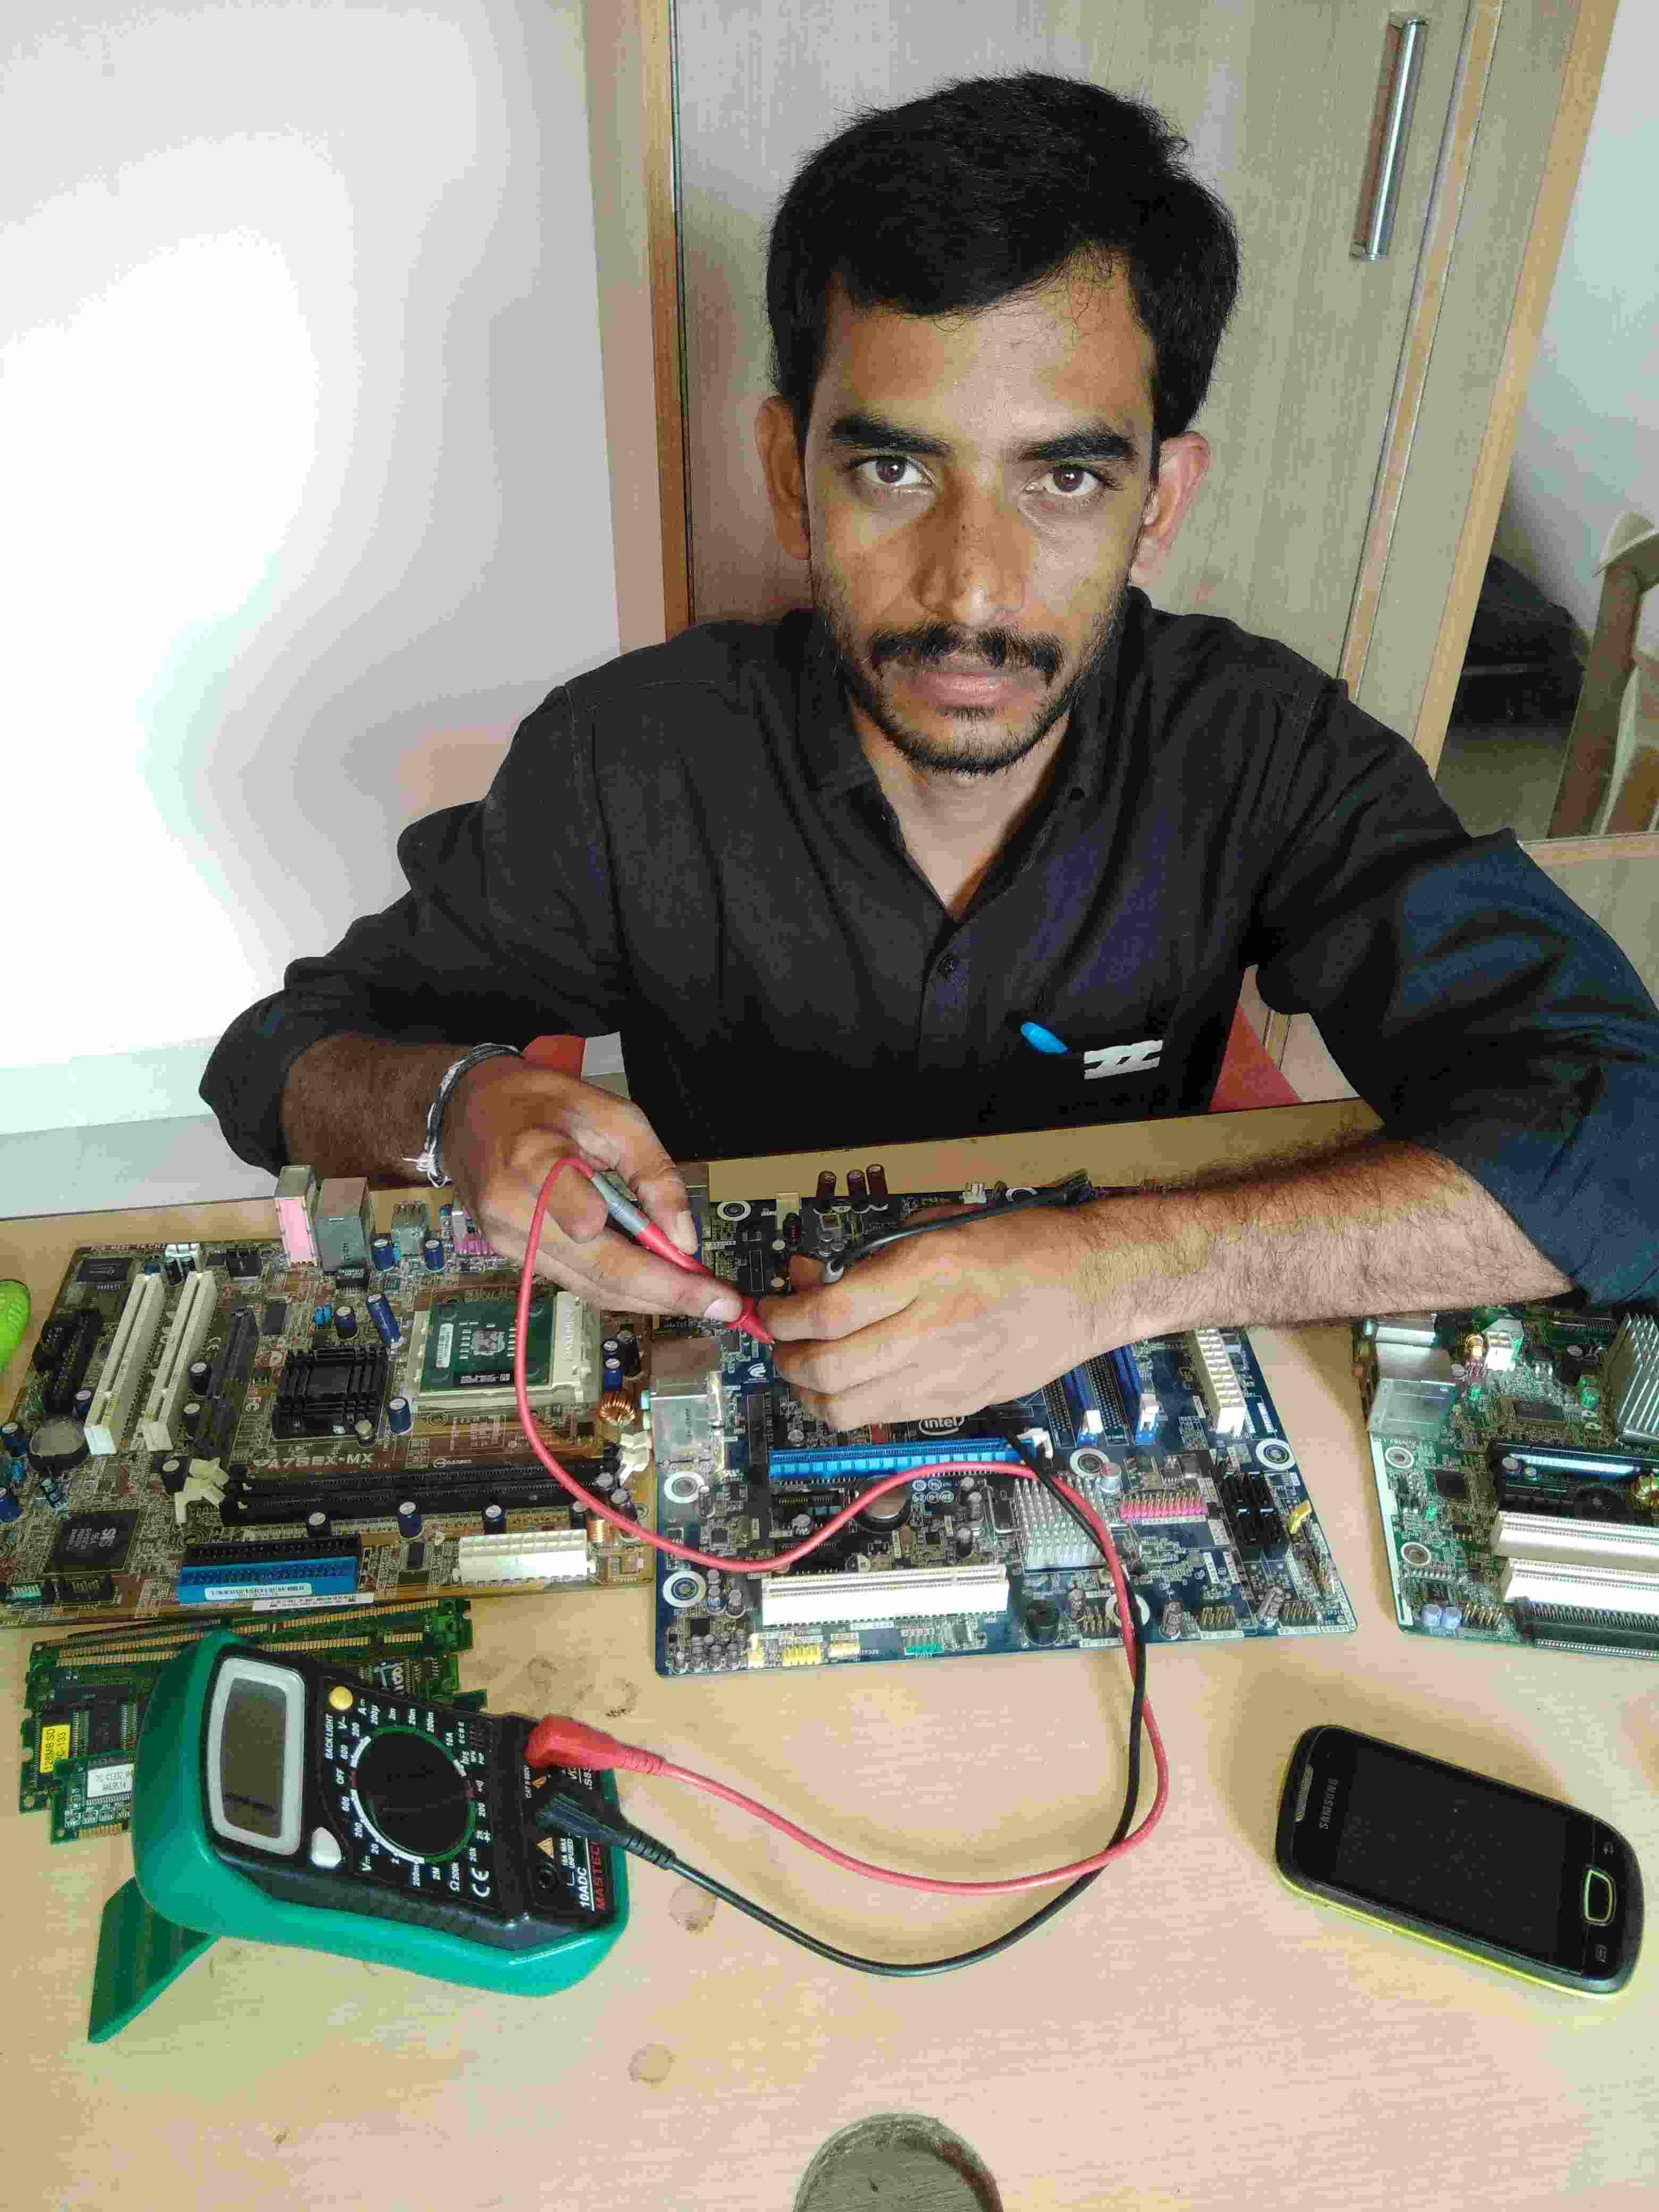 Laptop Dessktop Card Level Training Repairing Course Electrical Wiring Books Desktop Motherboard